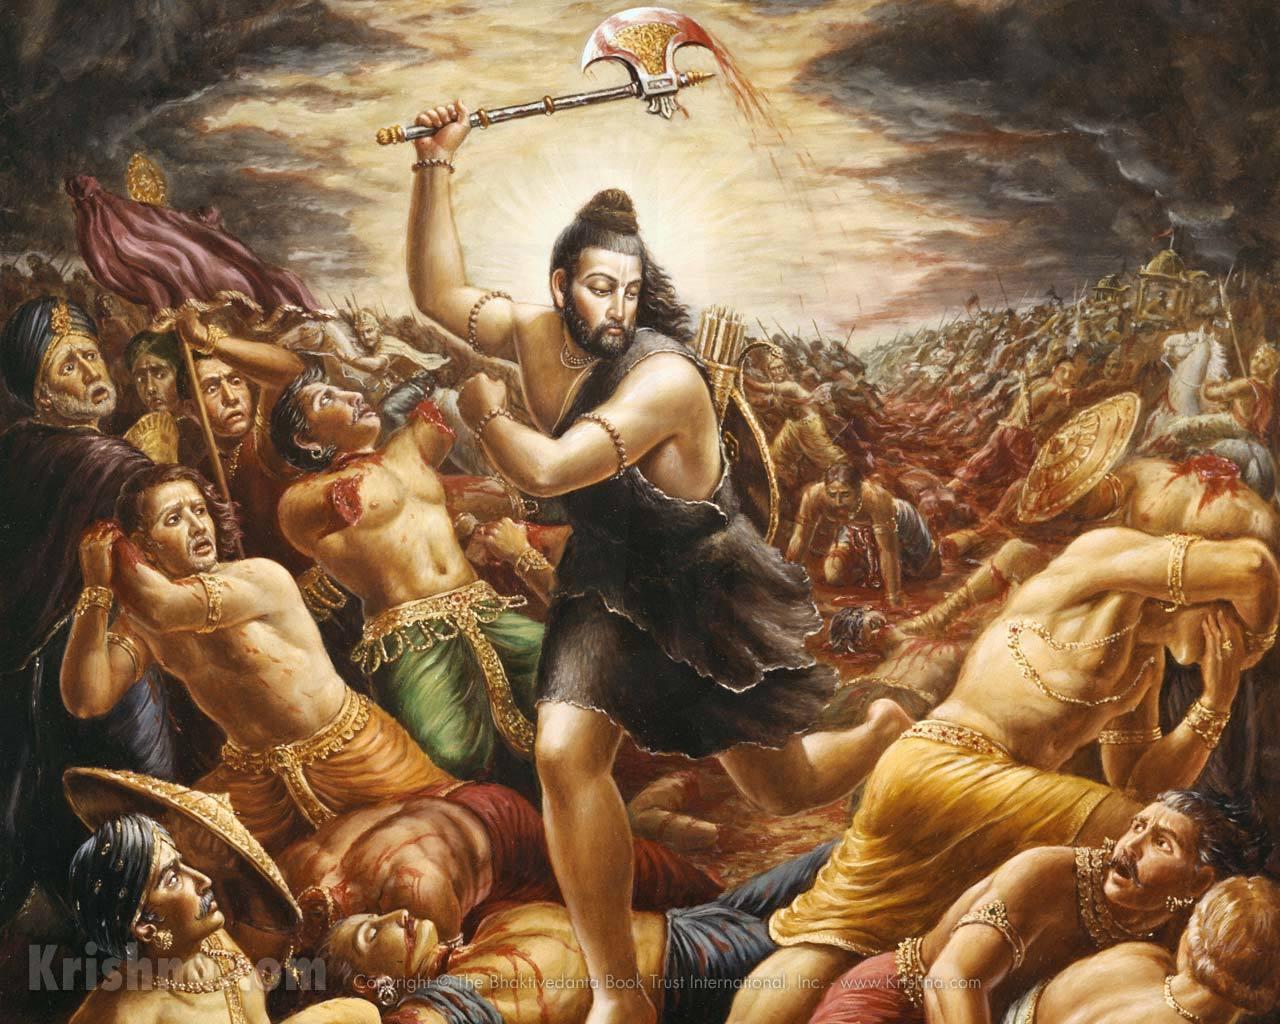 Махабхарата - Господь Парашурама уничтожает кшатриев